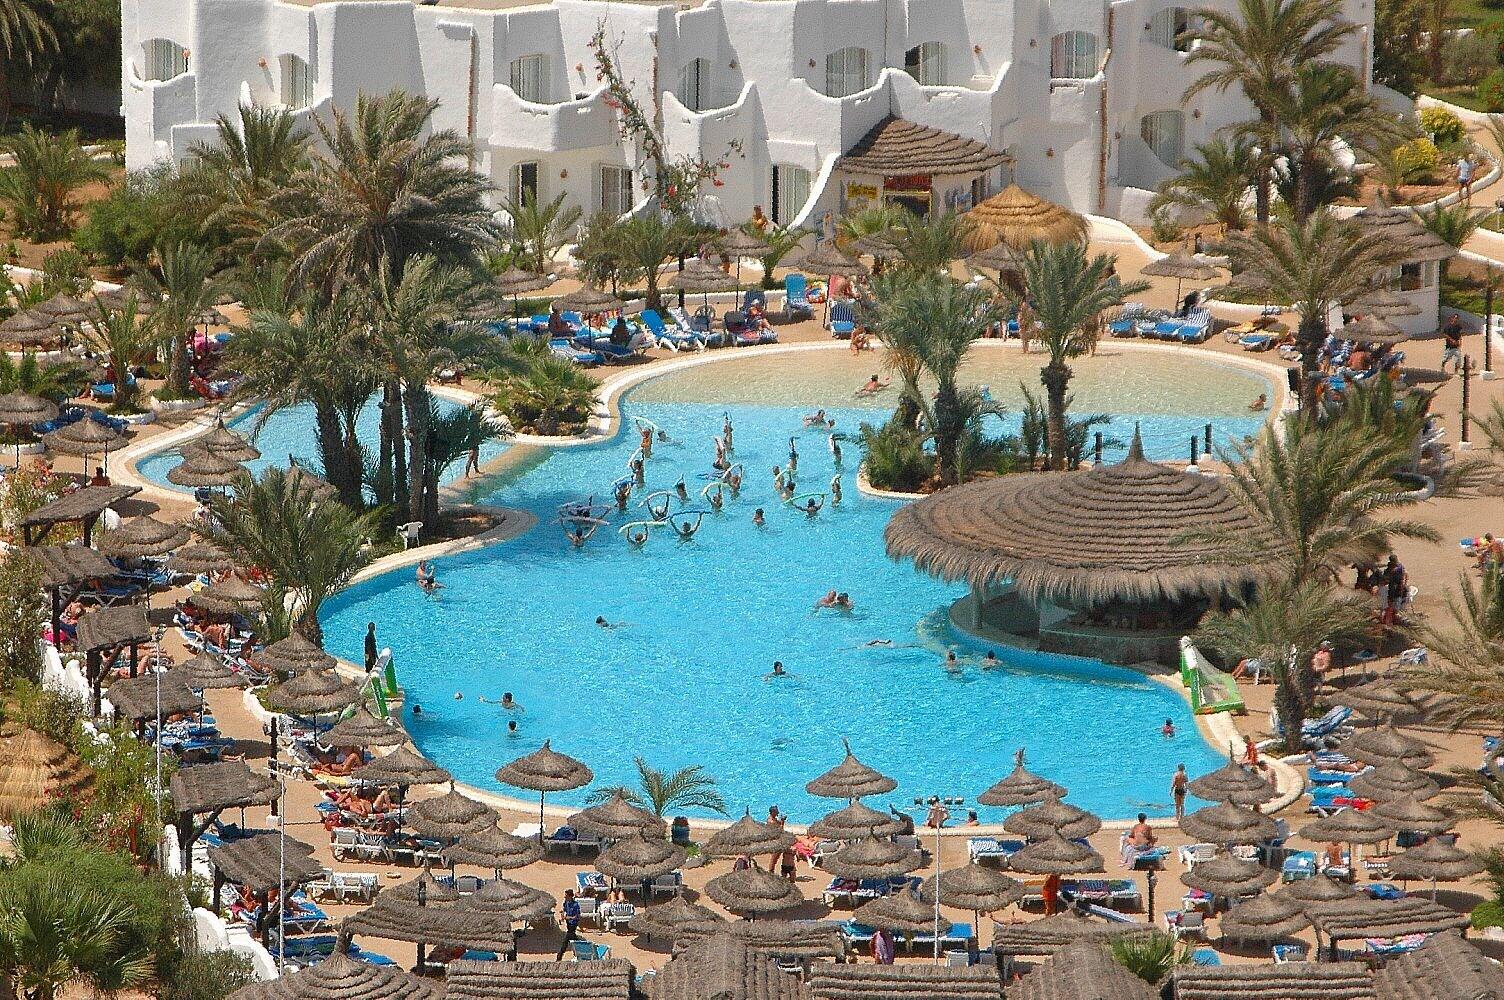 Hotel Fiesta Beach Djerba - All Inclusive, Djerba Midoun